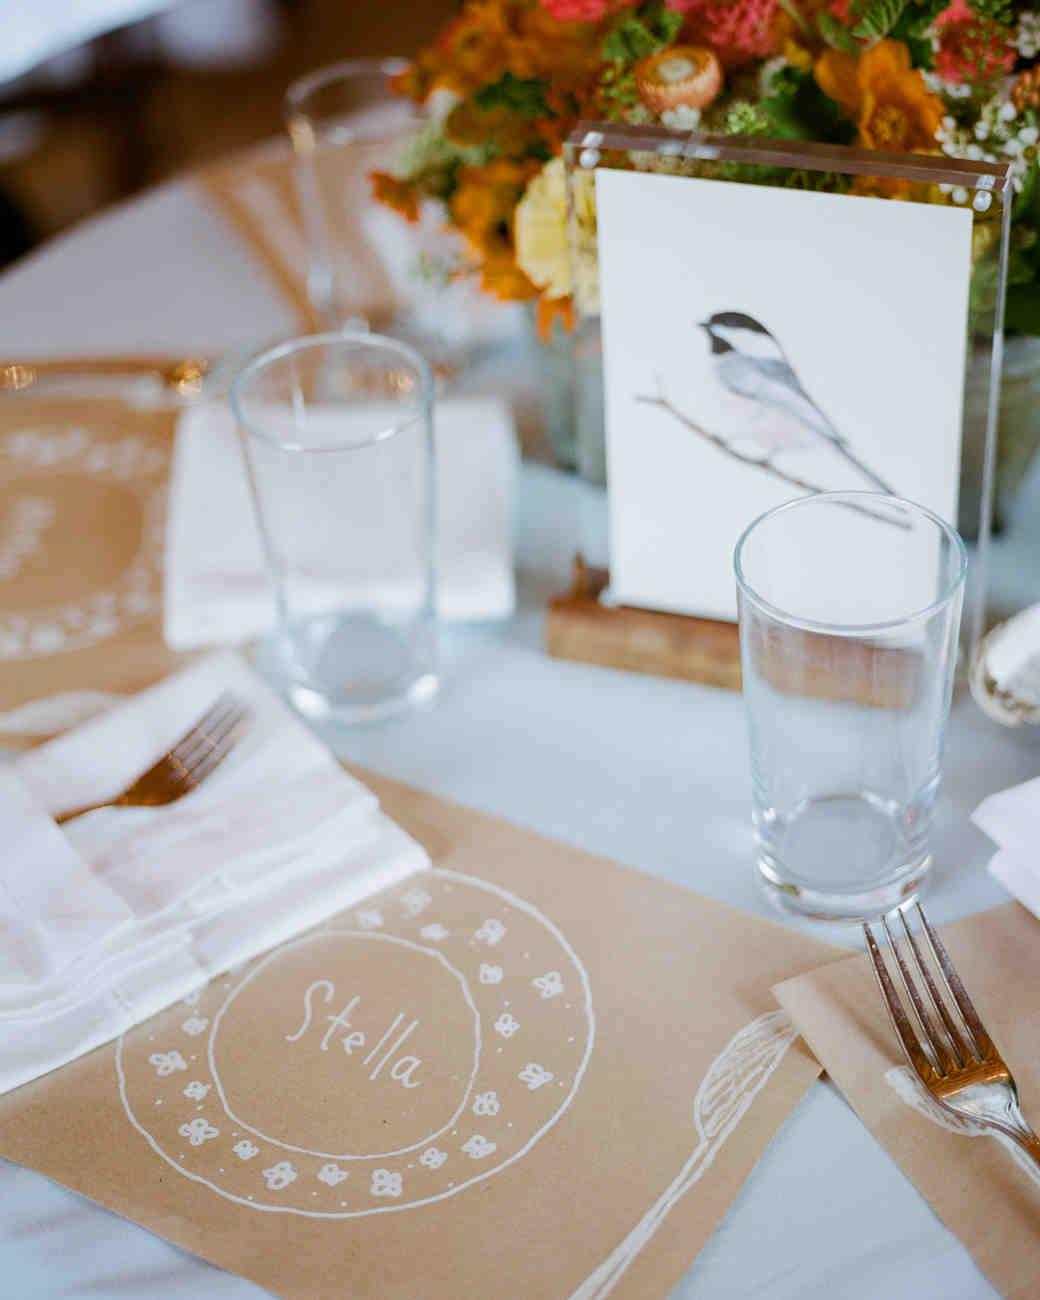 jocelyn-graham-wedding-placemat-1114-s111847-0315.jpg